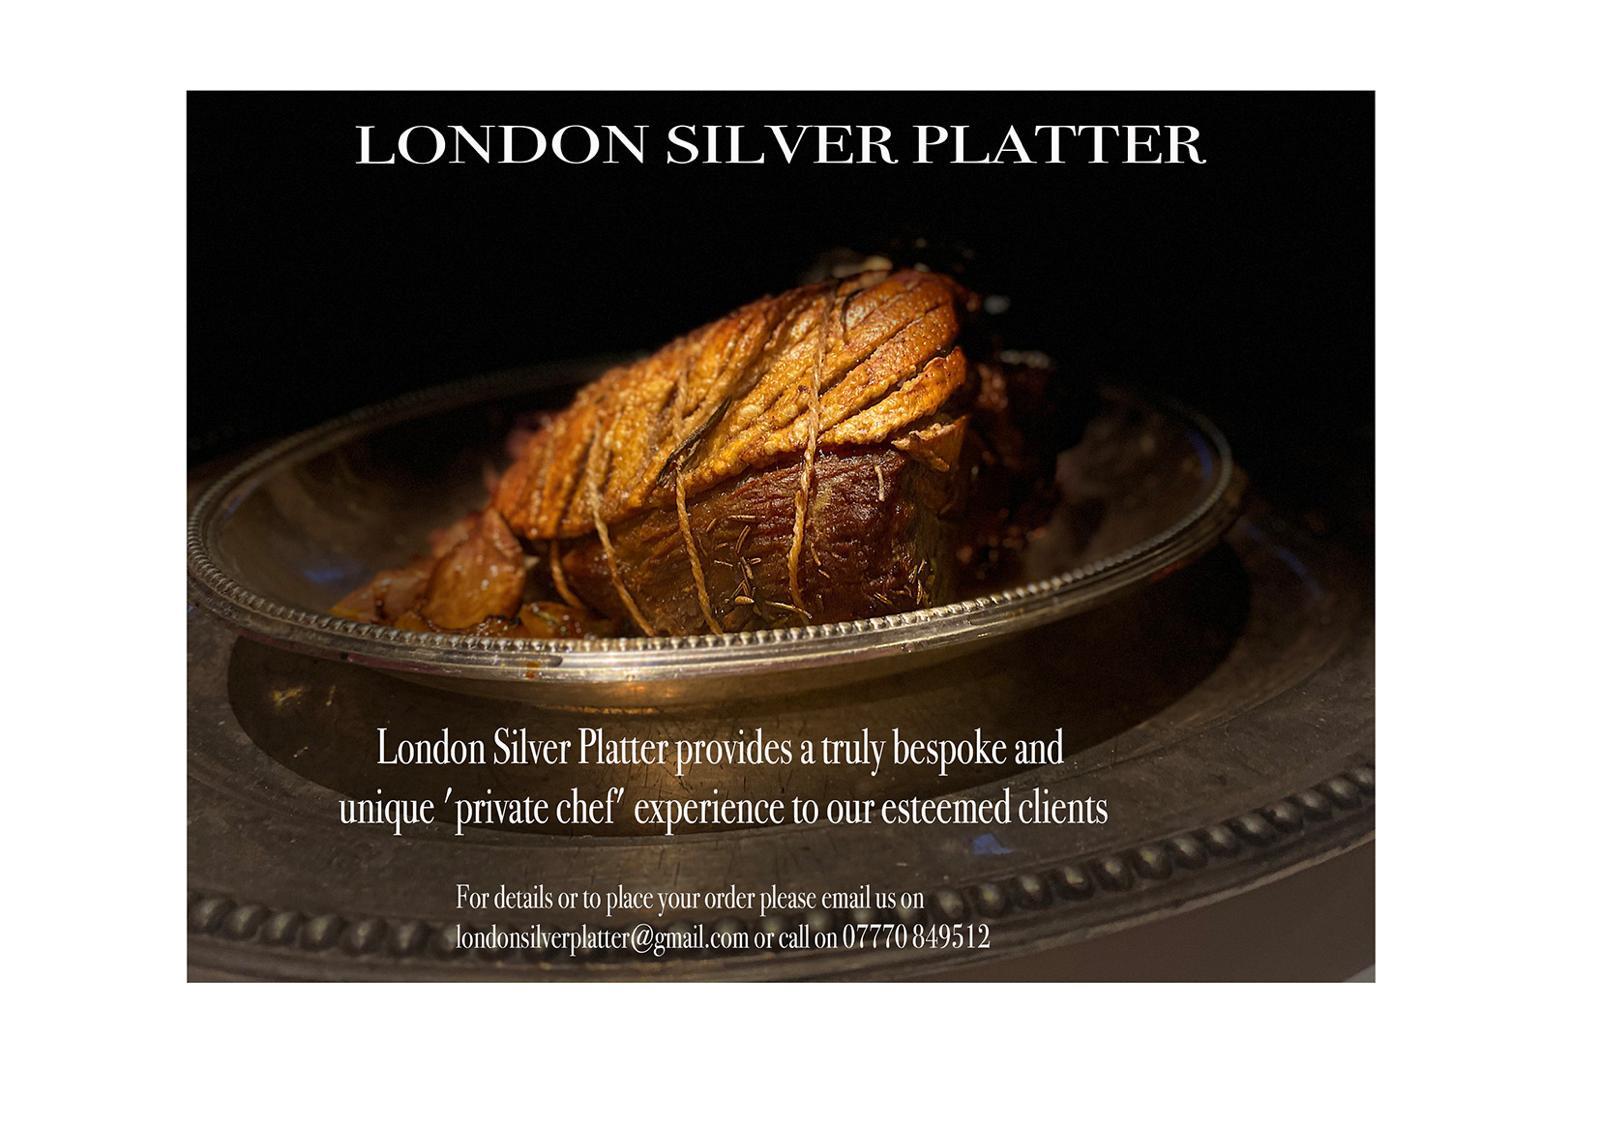 London Silver Platter